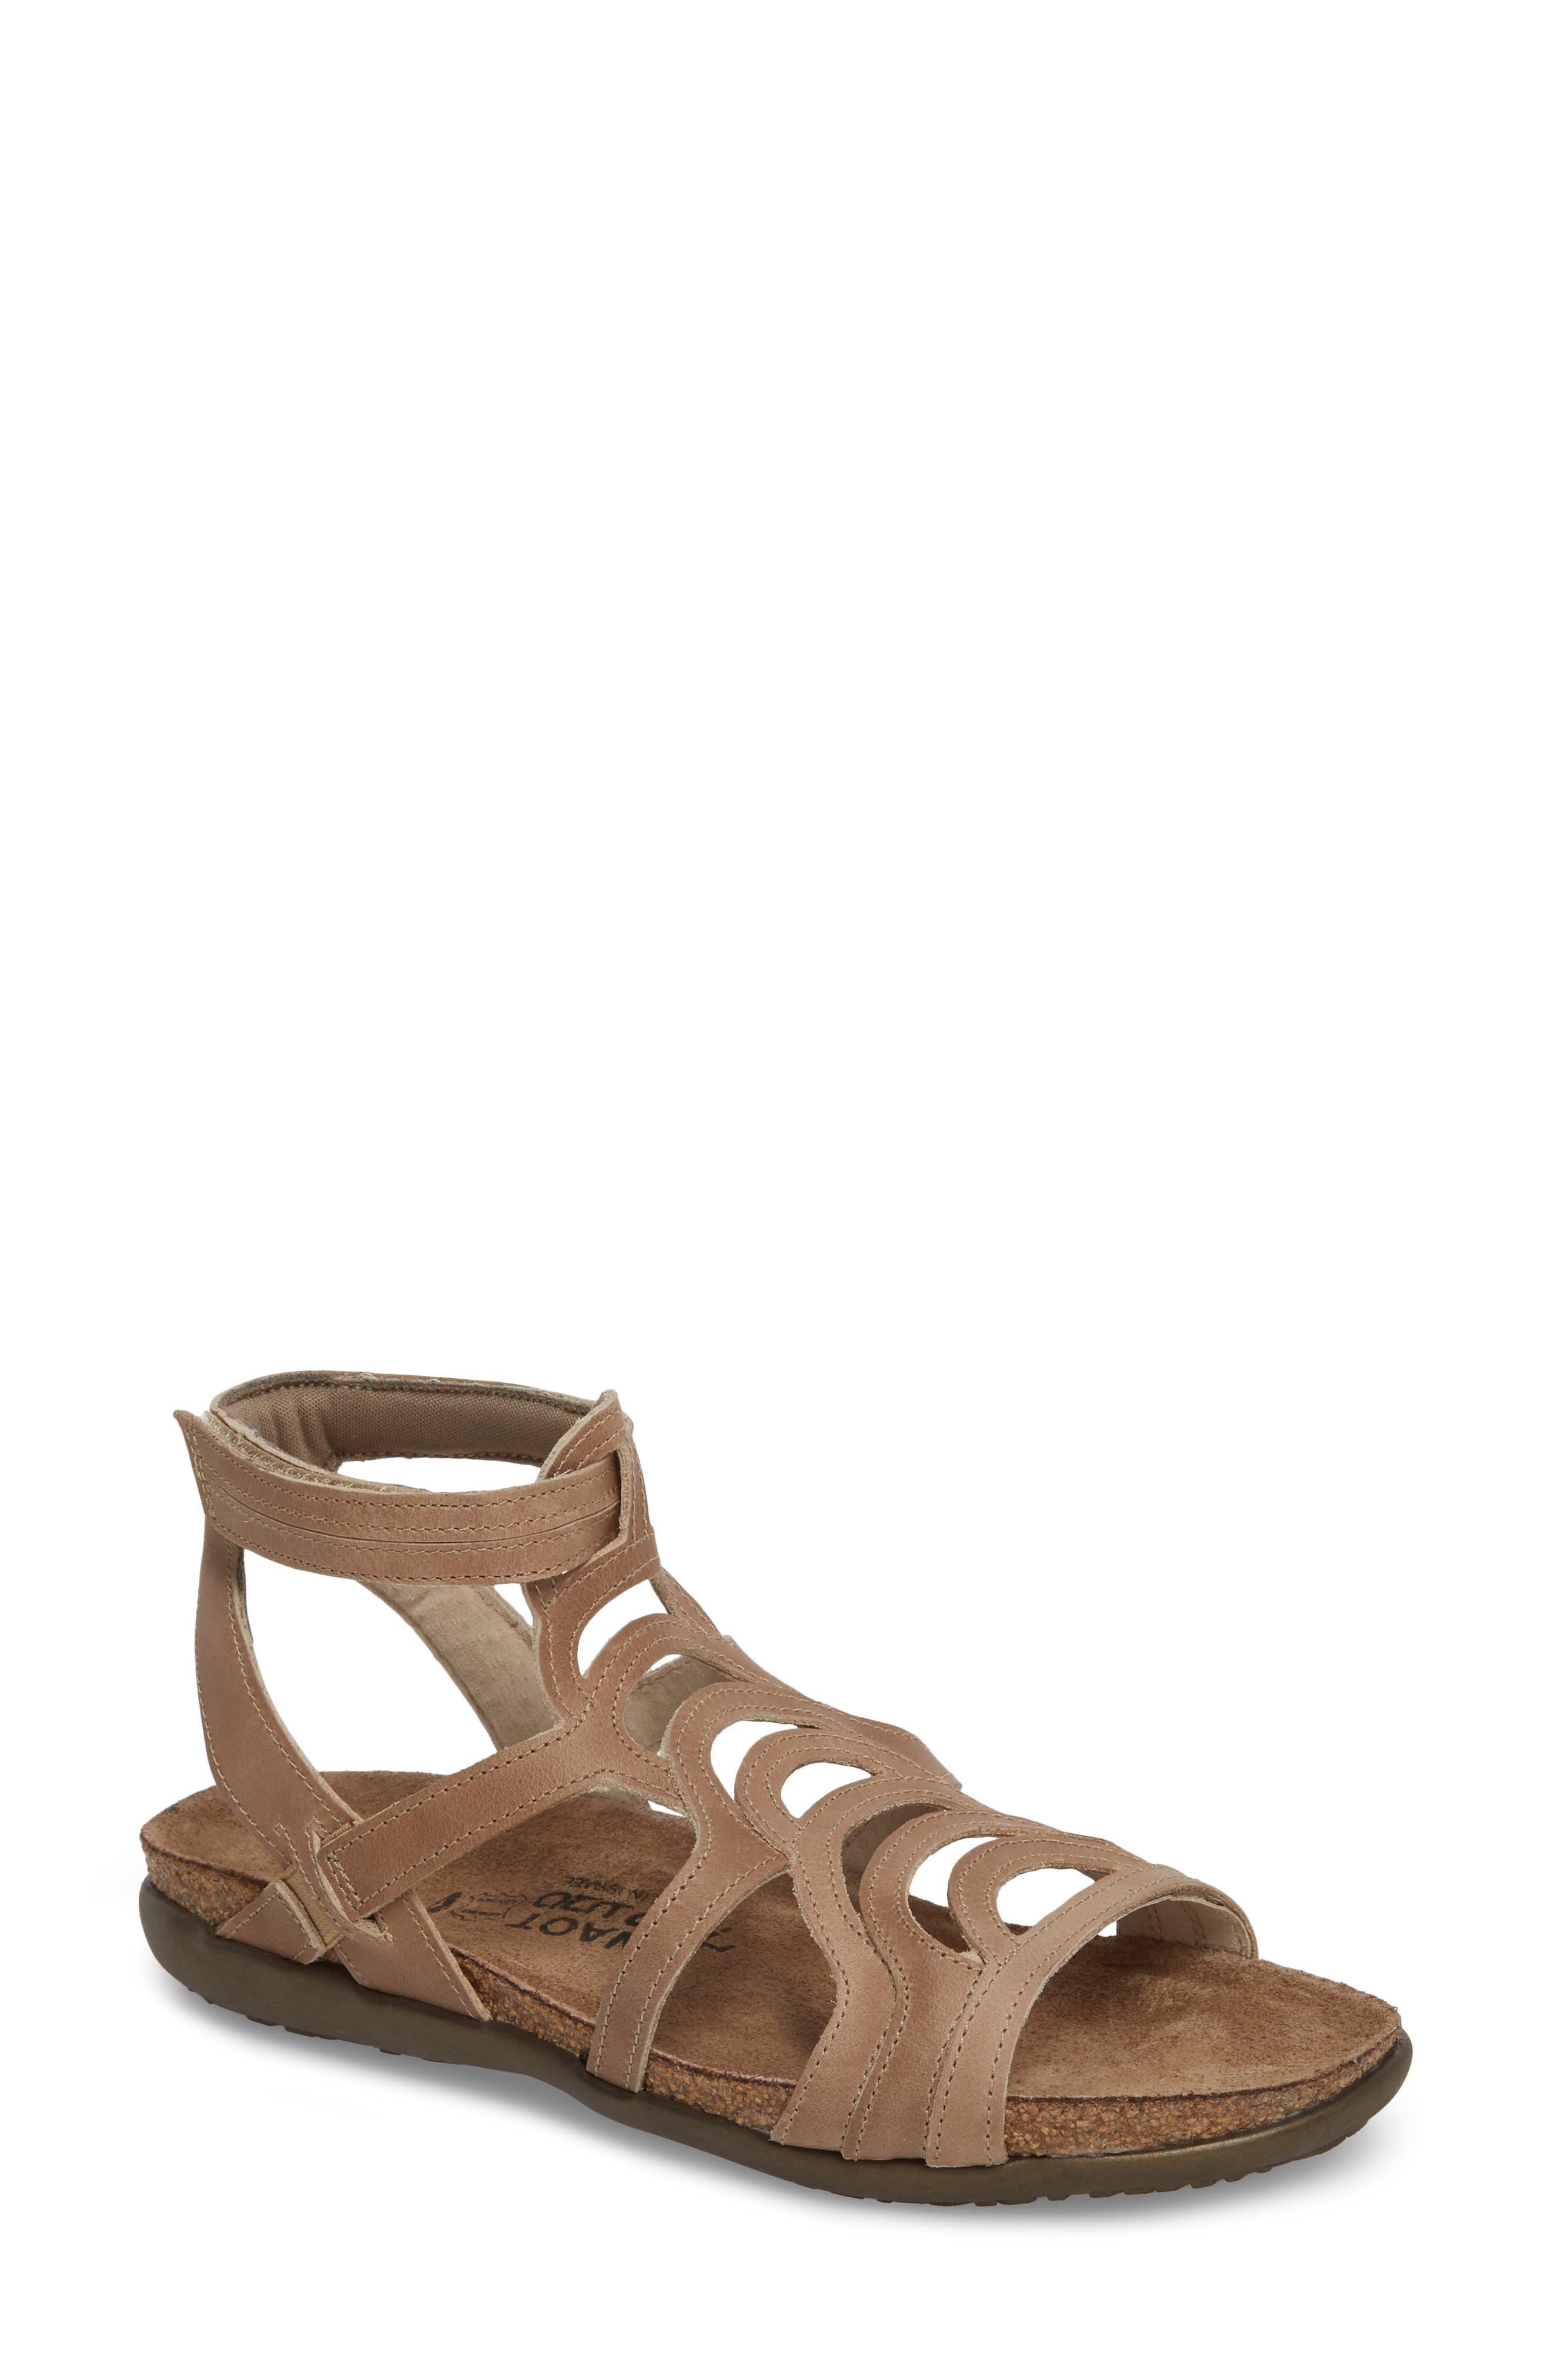 'Sara' Gladiator Sandal,                             Main thumbnail 1, color,                             Khaki Beige Leather